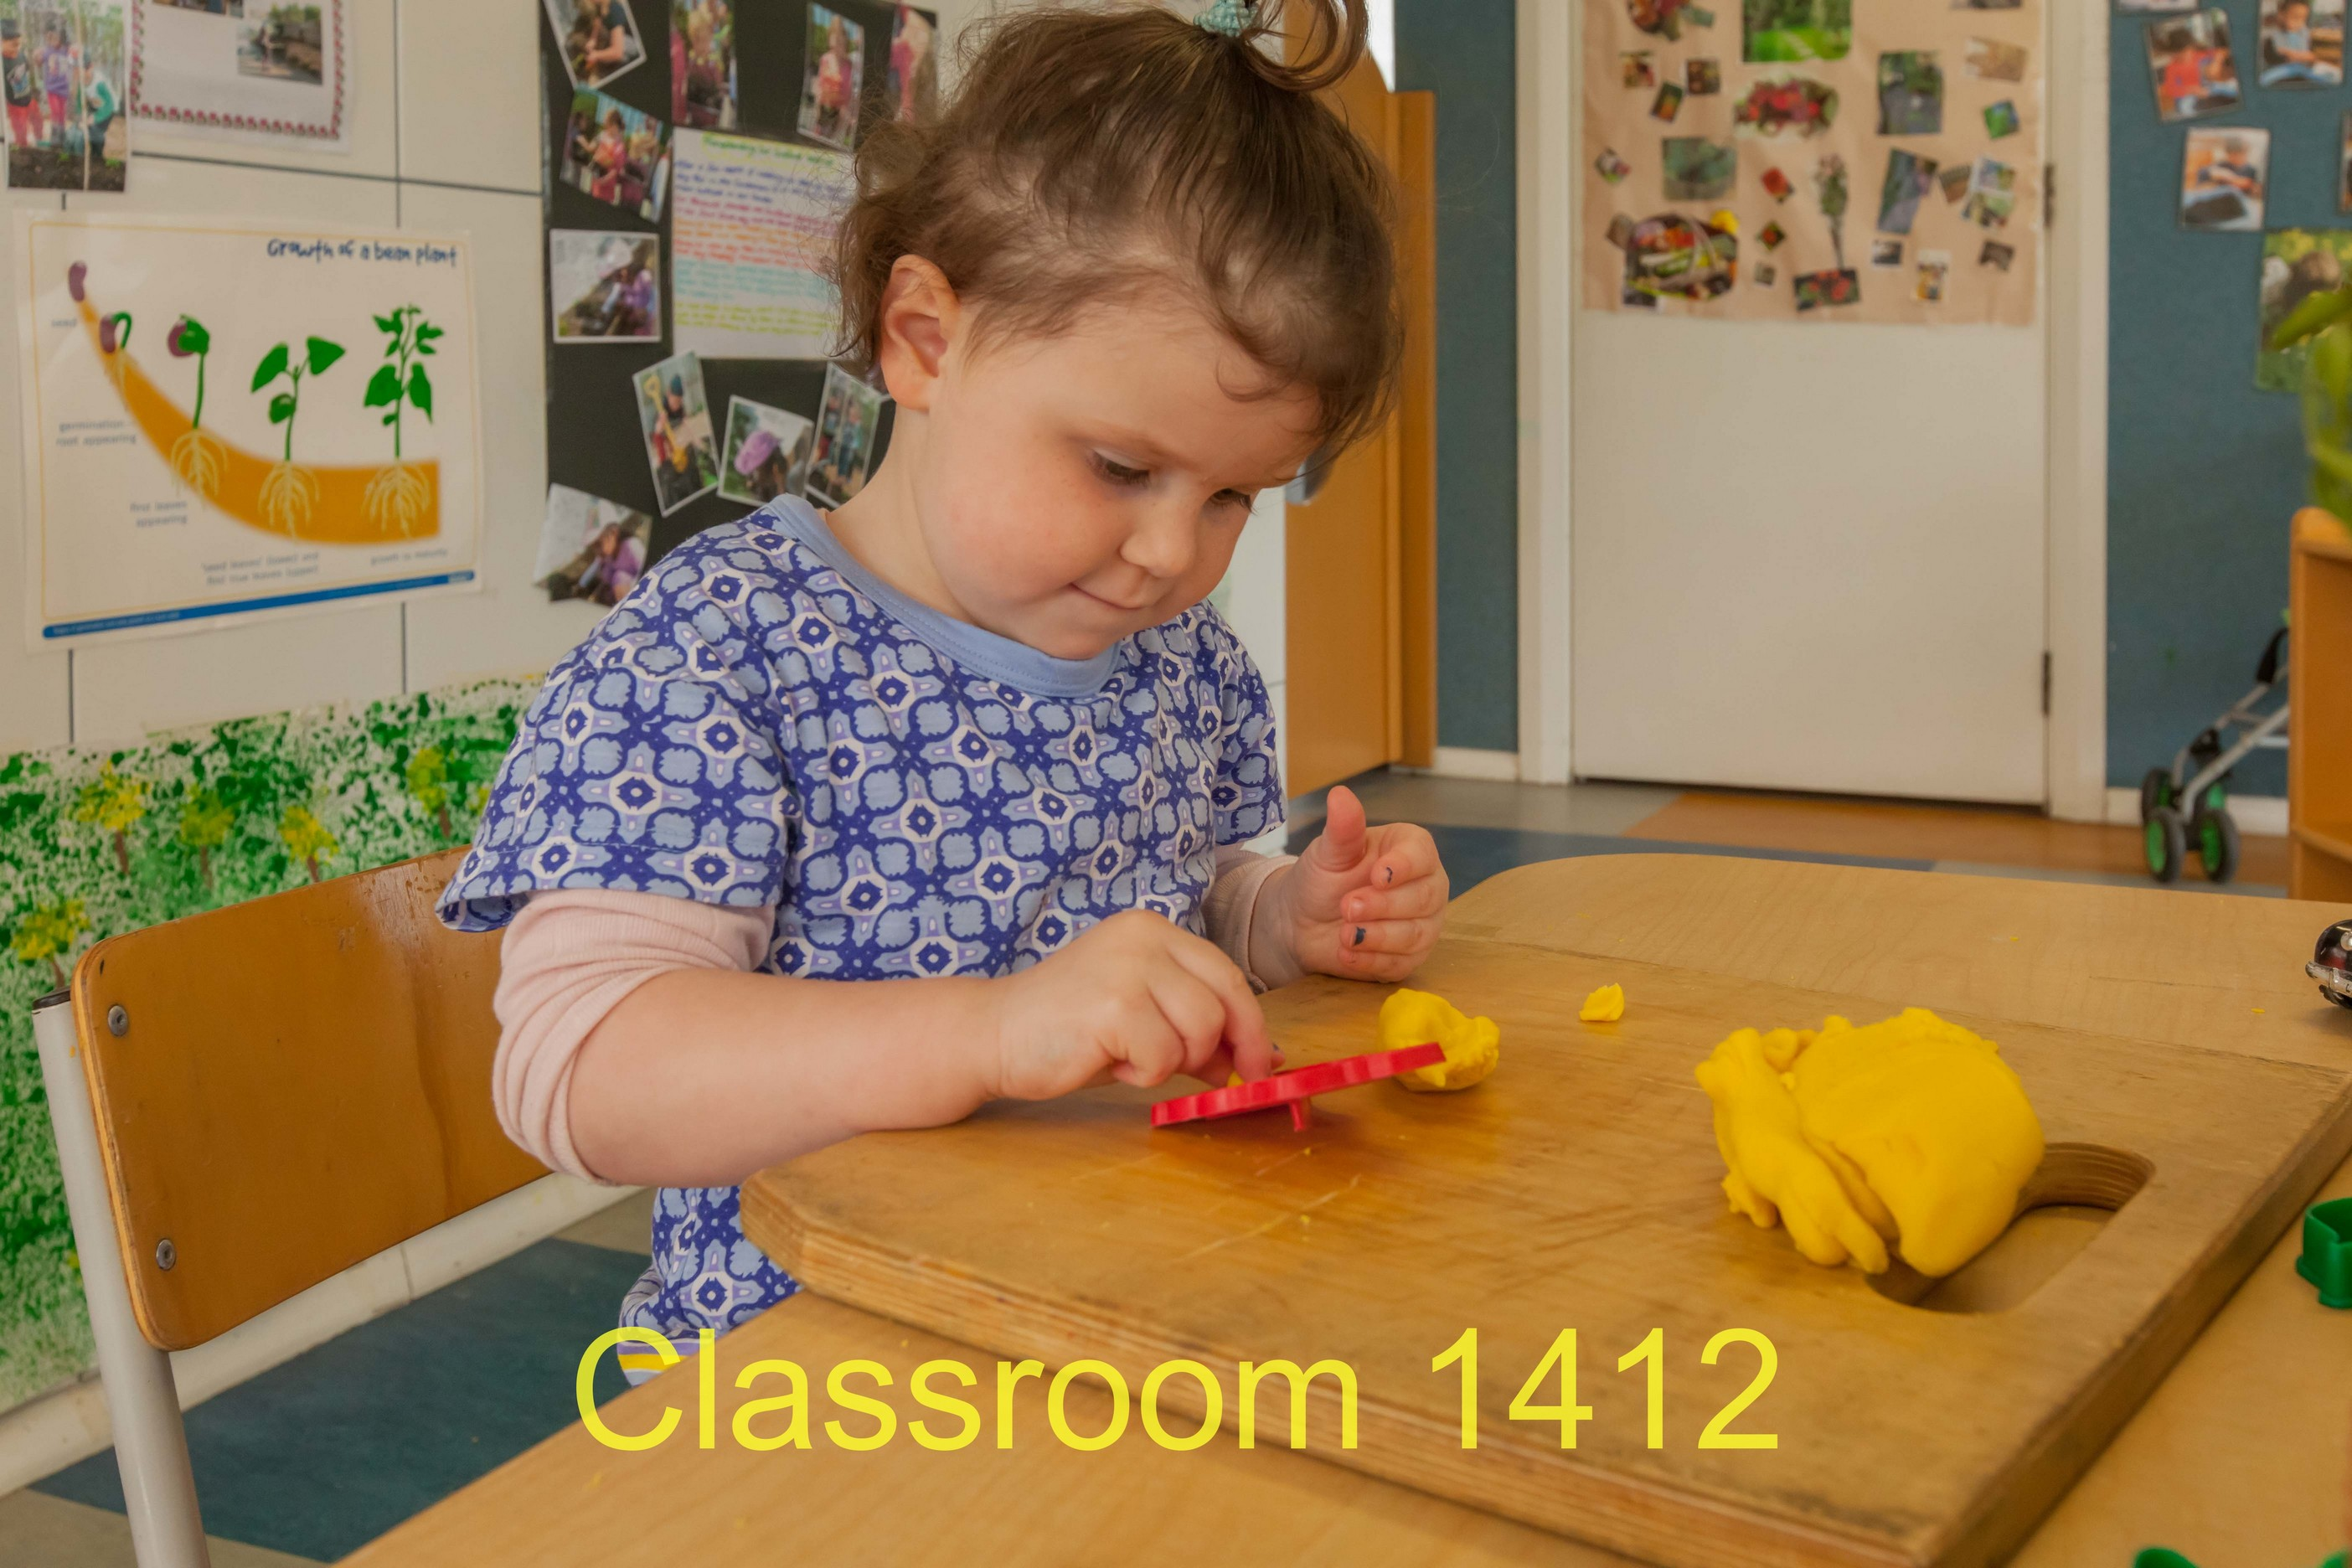 Classroom 1412